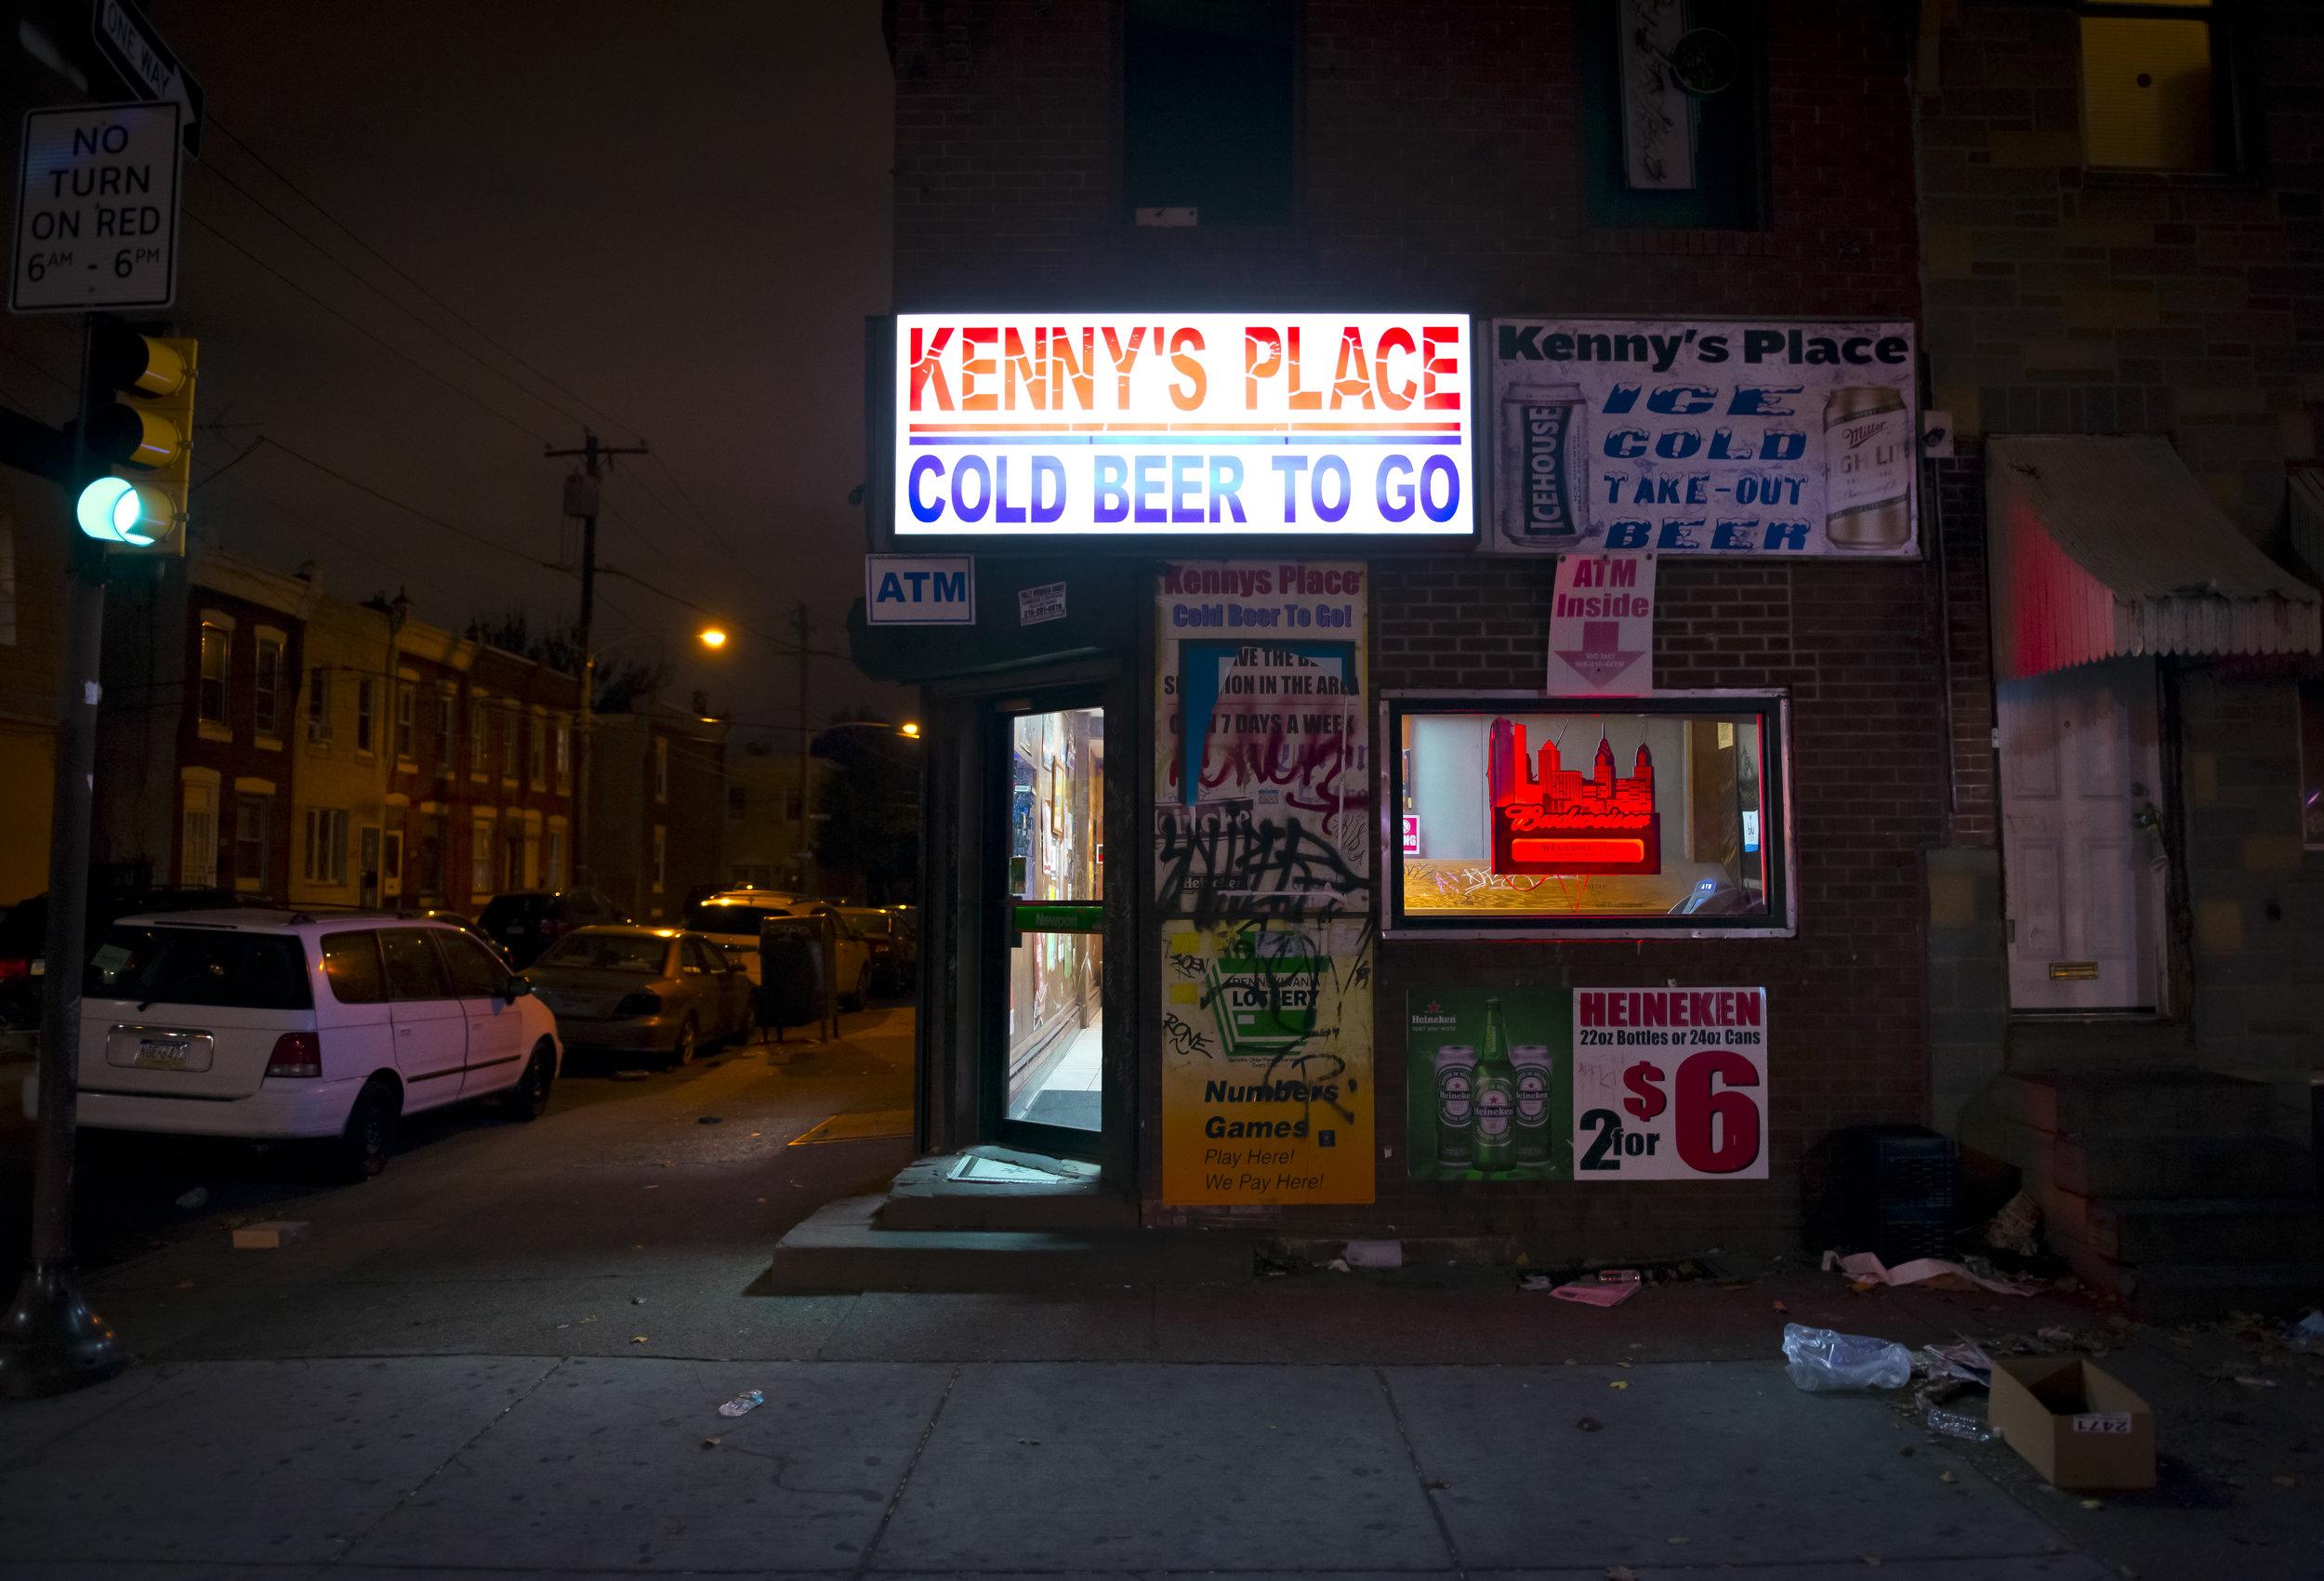 KENNY'S PLACE2-KENSINGTON-112016 1111pm-2.jpg